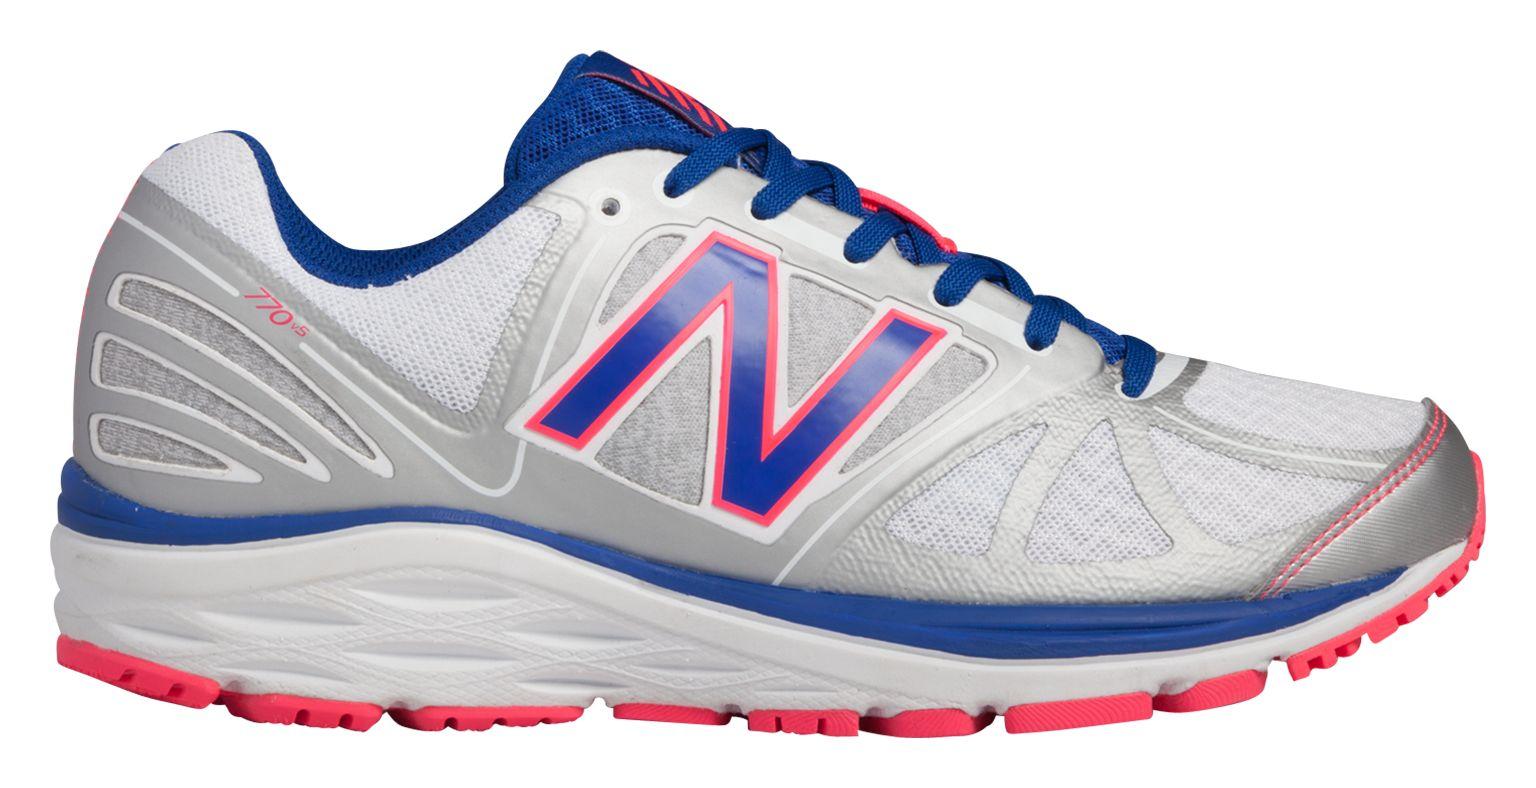 New Balance Womens 770v 5 Running Shoes White